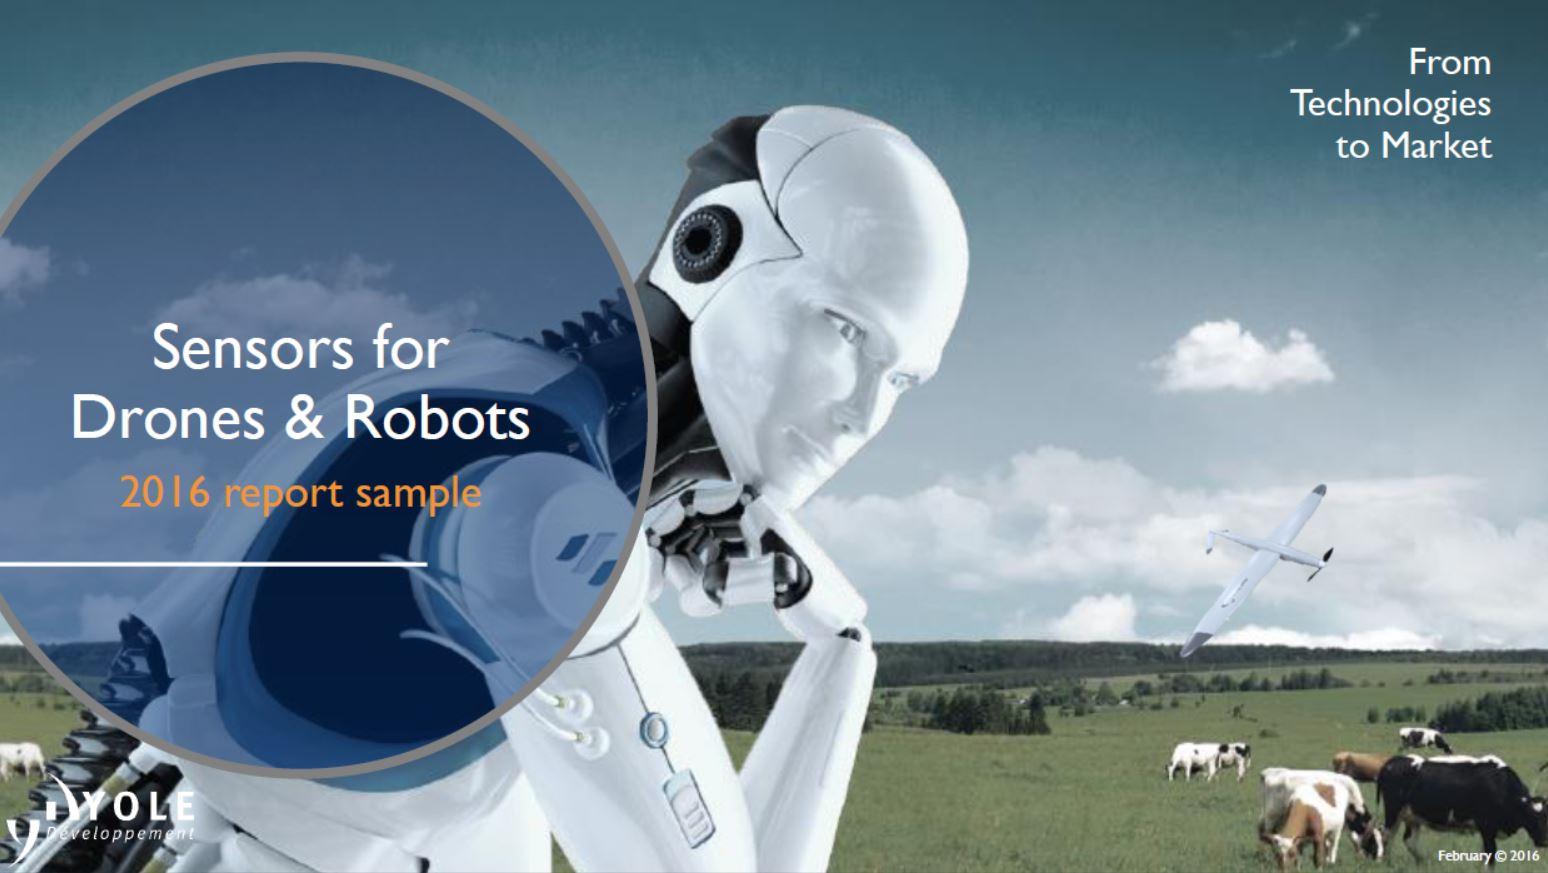 Sensors for drones and robots 2016 - Yole Developpement